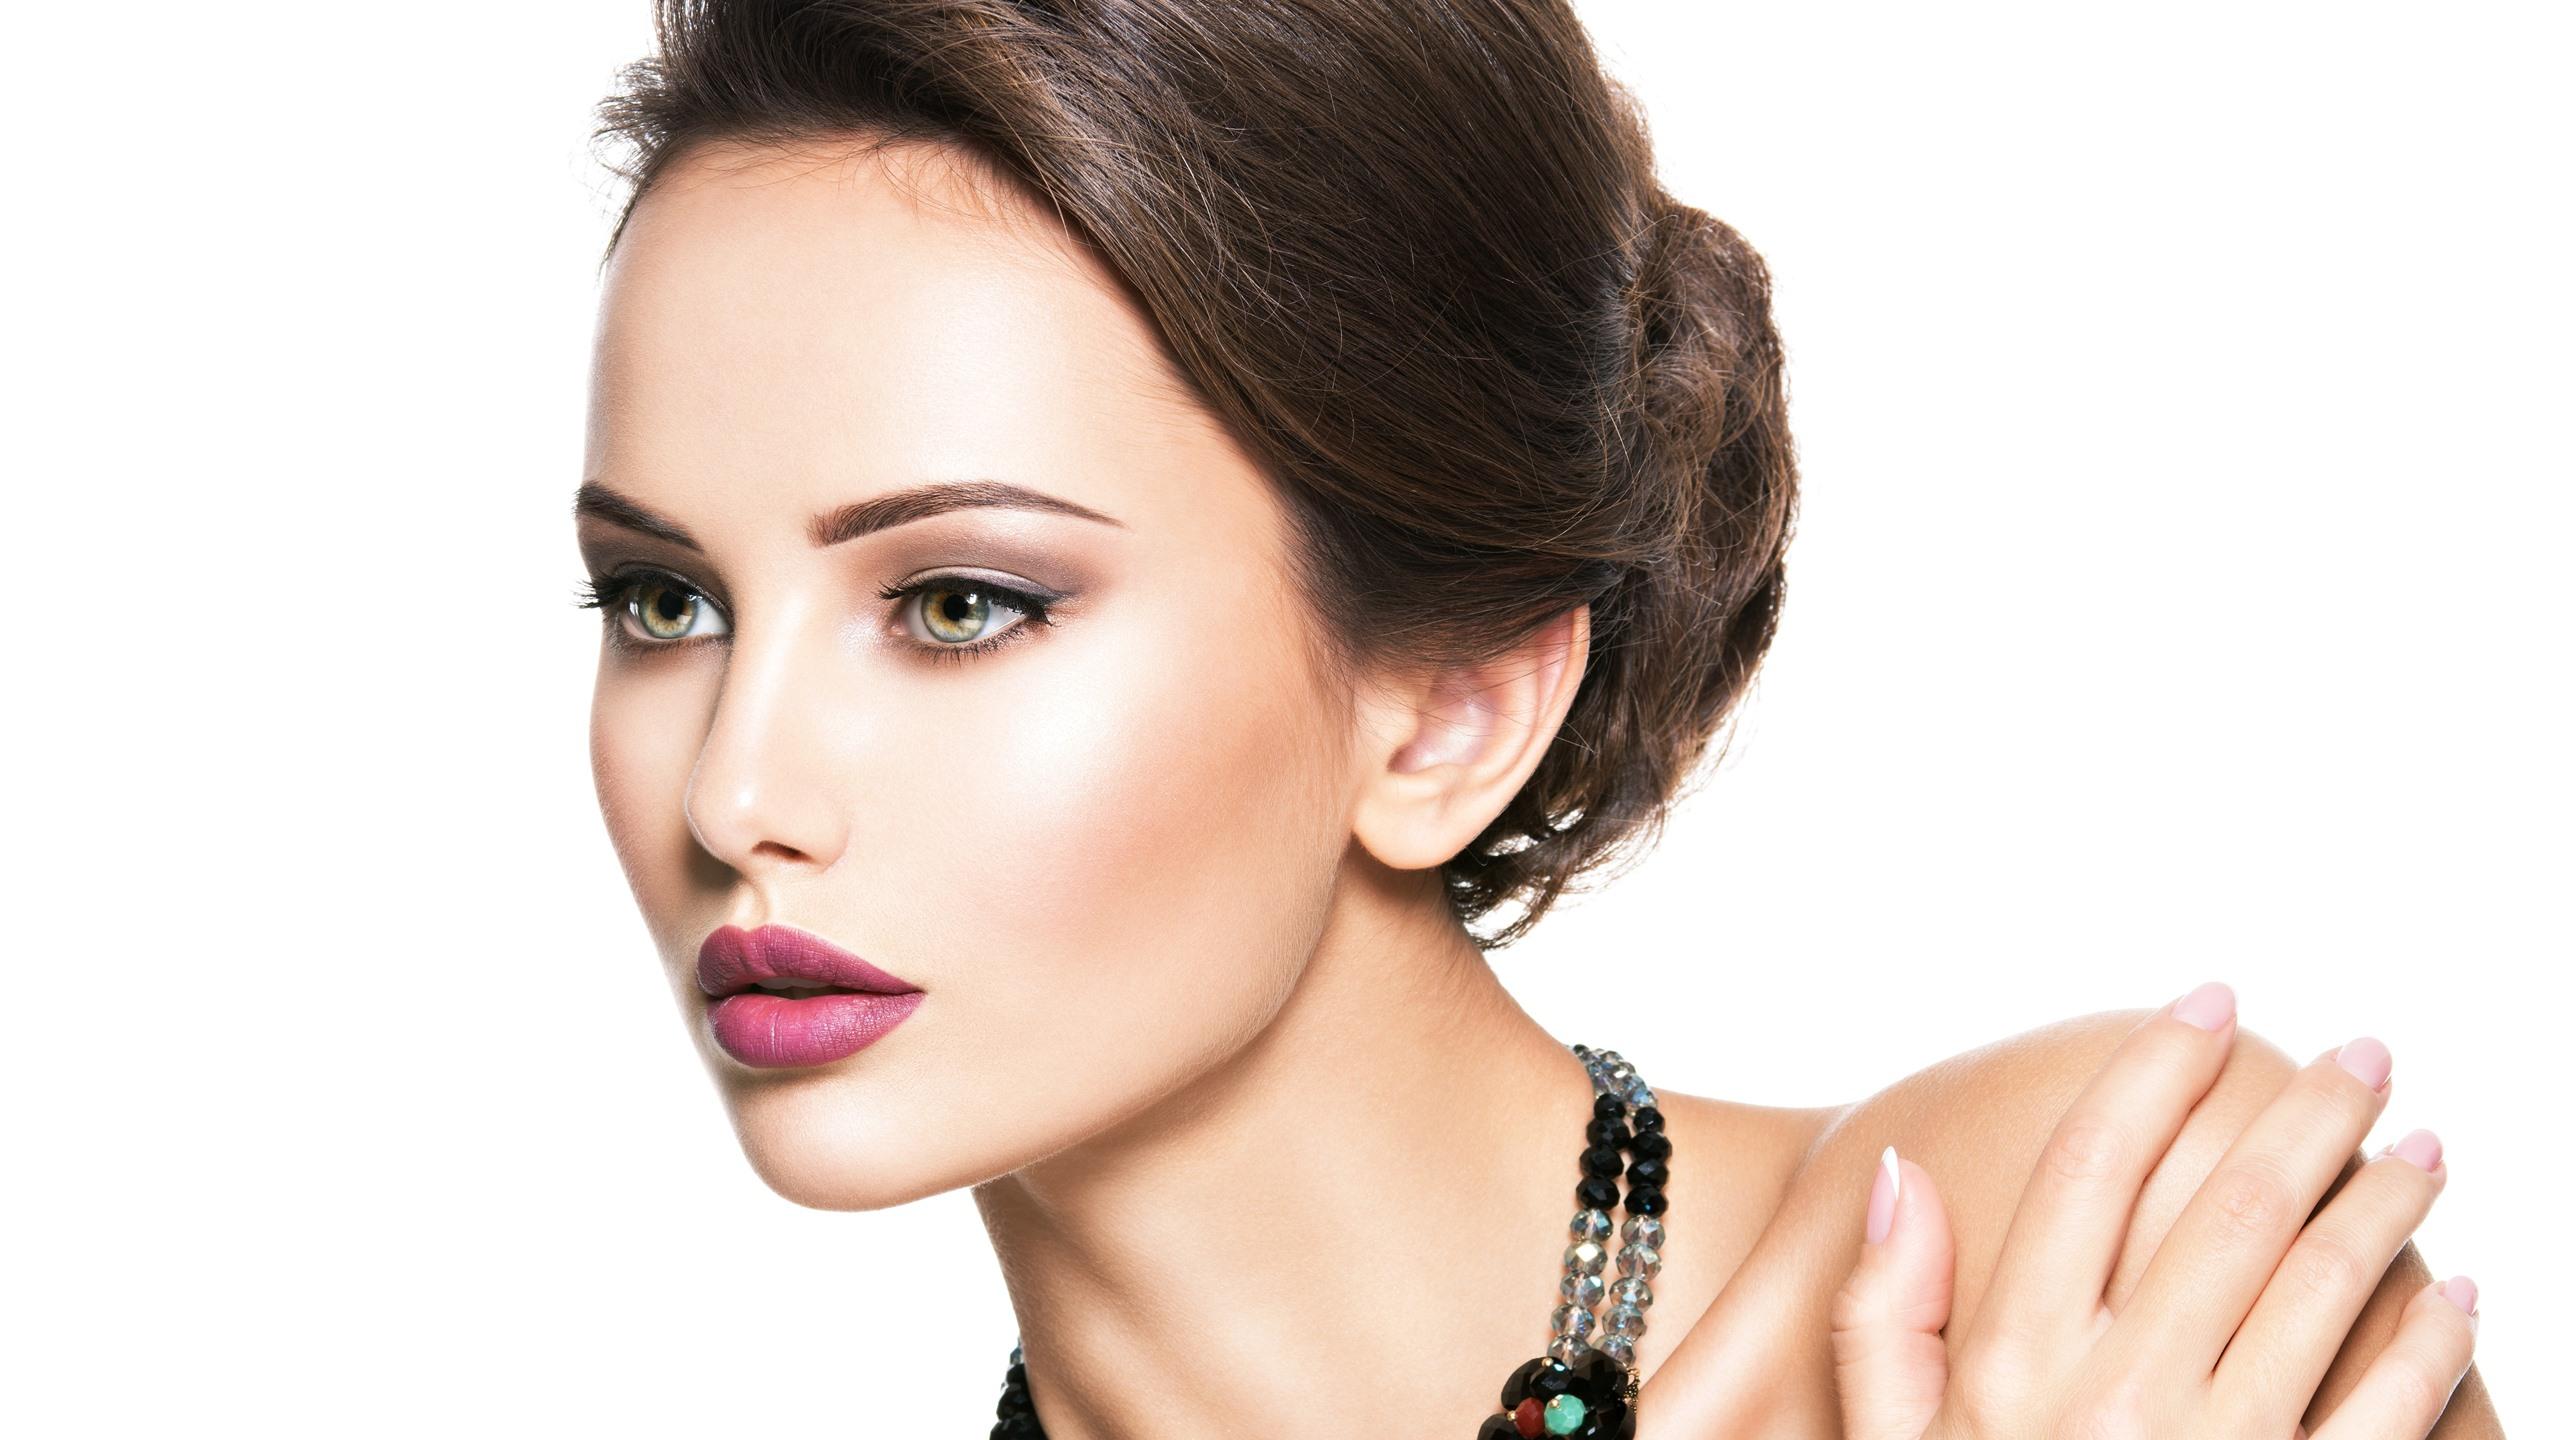 Wallpaper Fashion Girl, Beautiful Model, Jewelry, White Background 5120X2880 Uhd 5K -6211